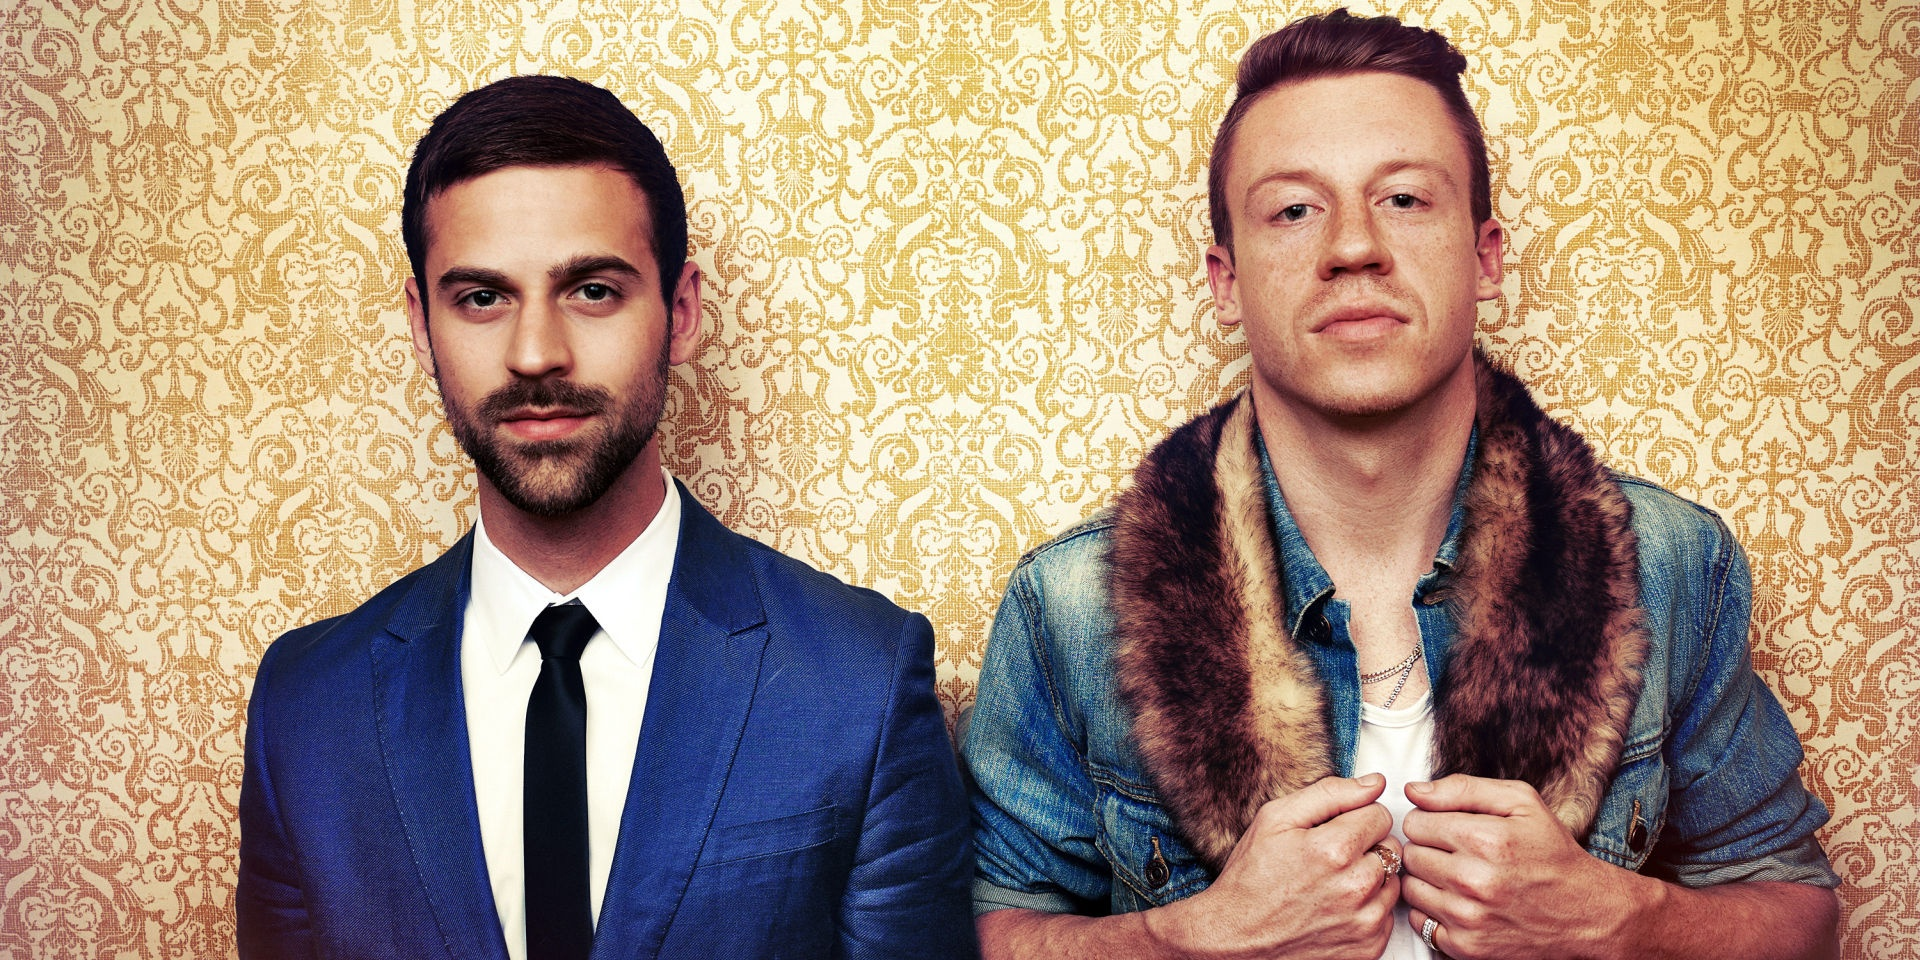 Macklemore & Ryan Lewis are coming to Singapore